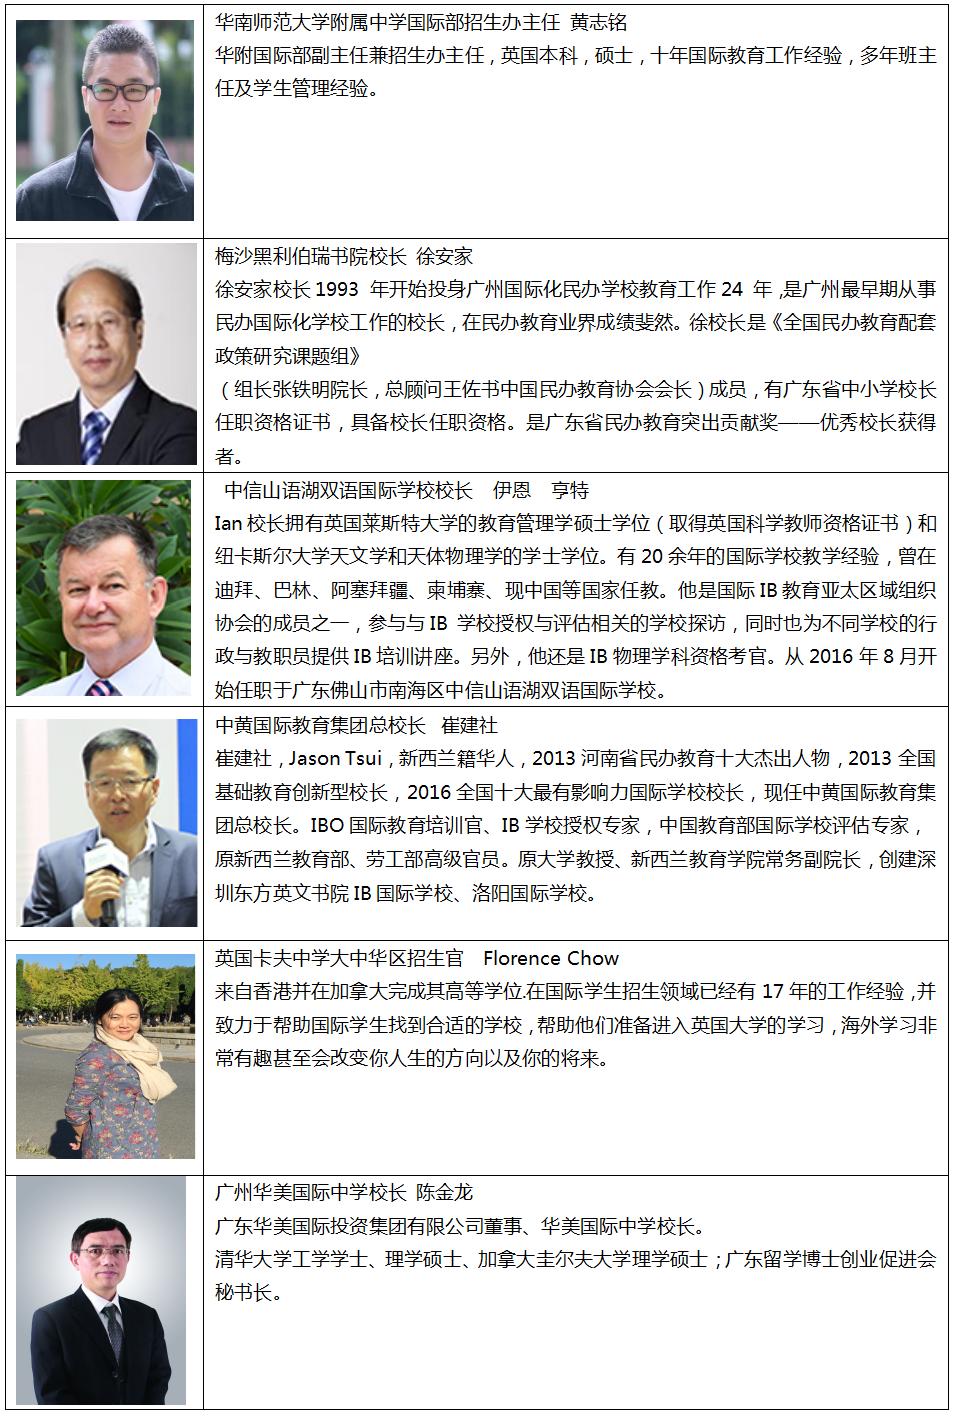 IEduChina2018 国际教育展暨国际教育高峰论坛【广州站】